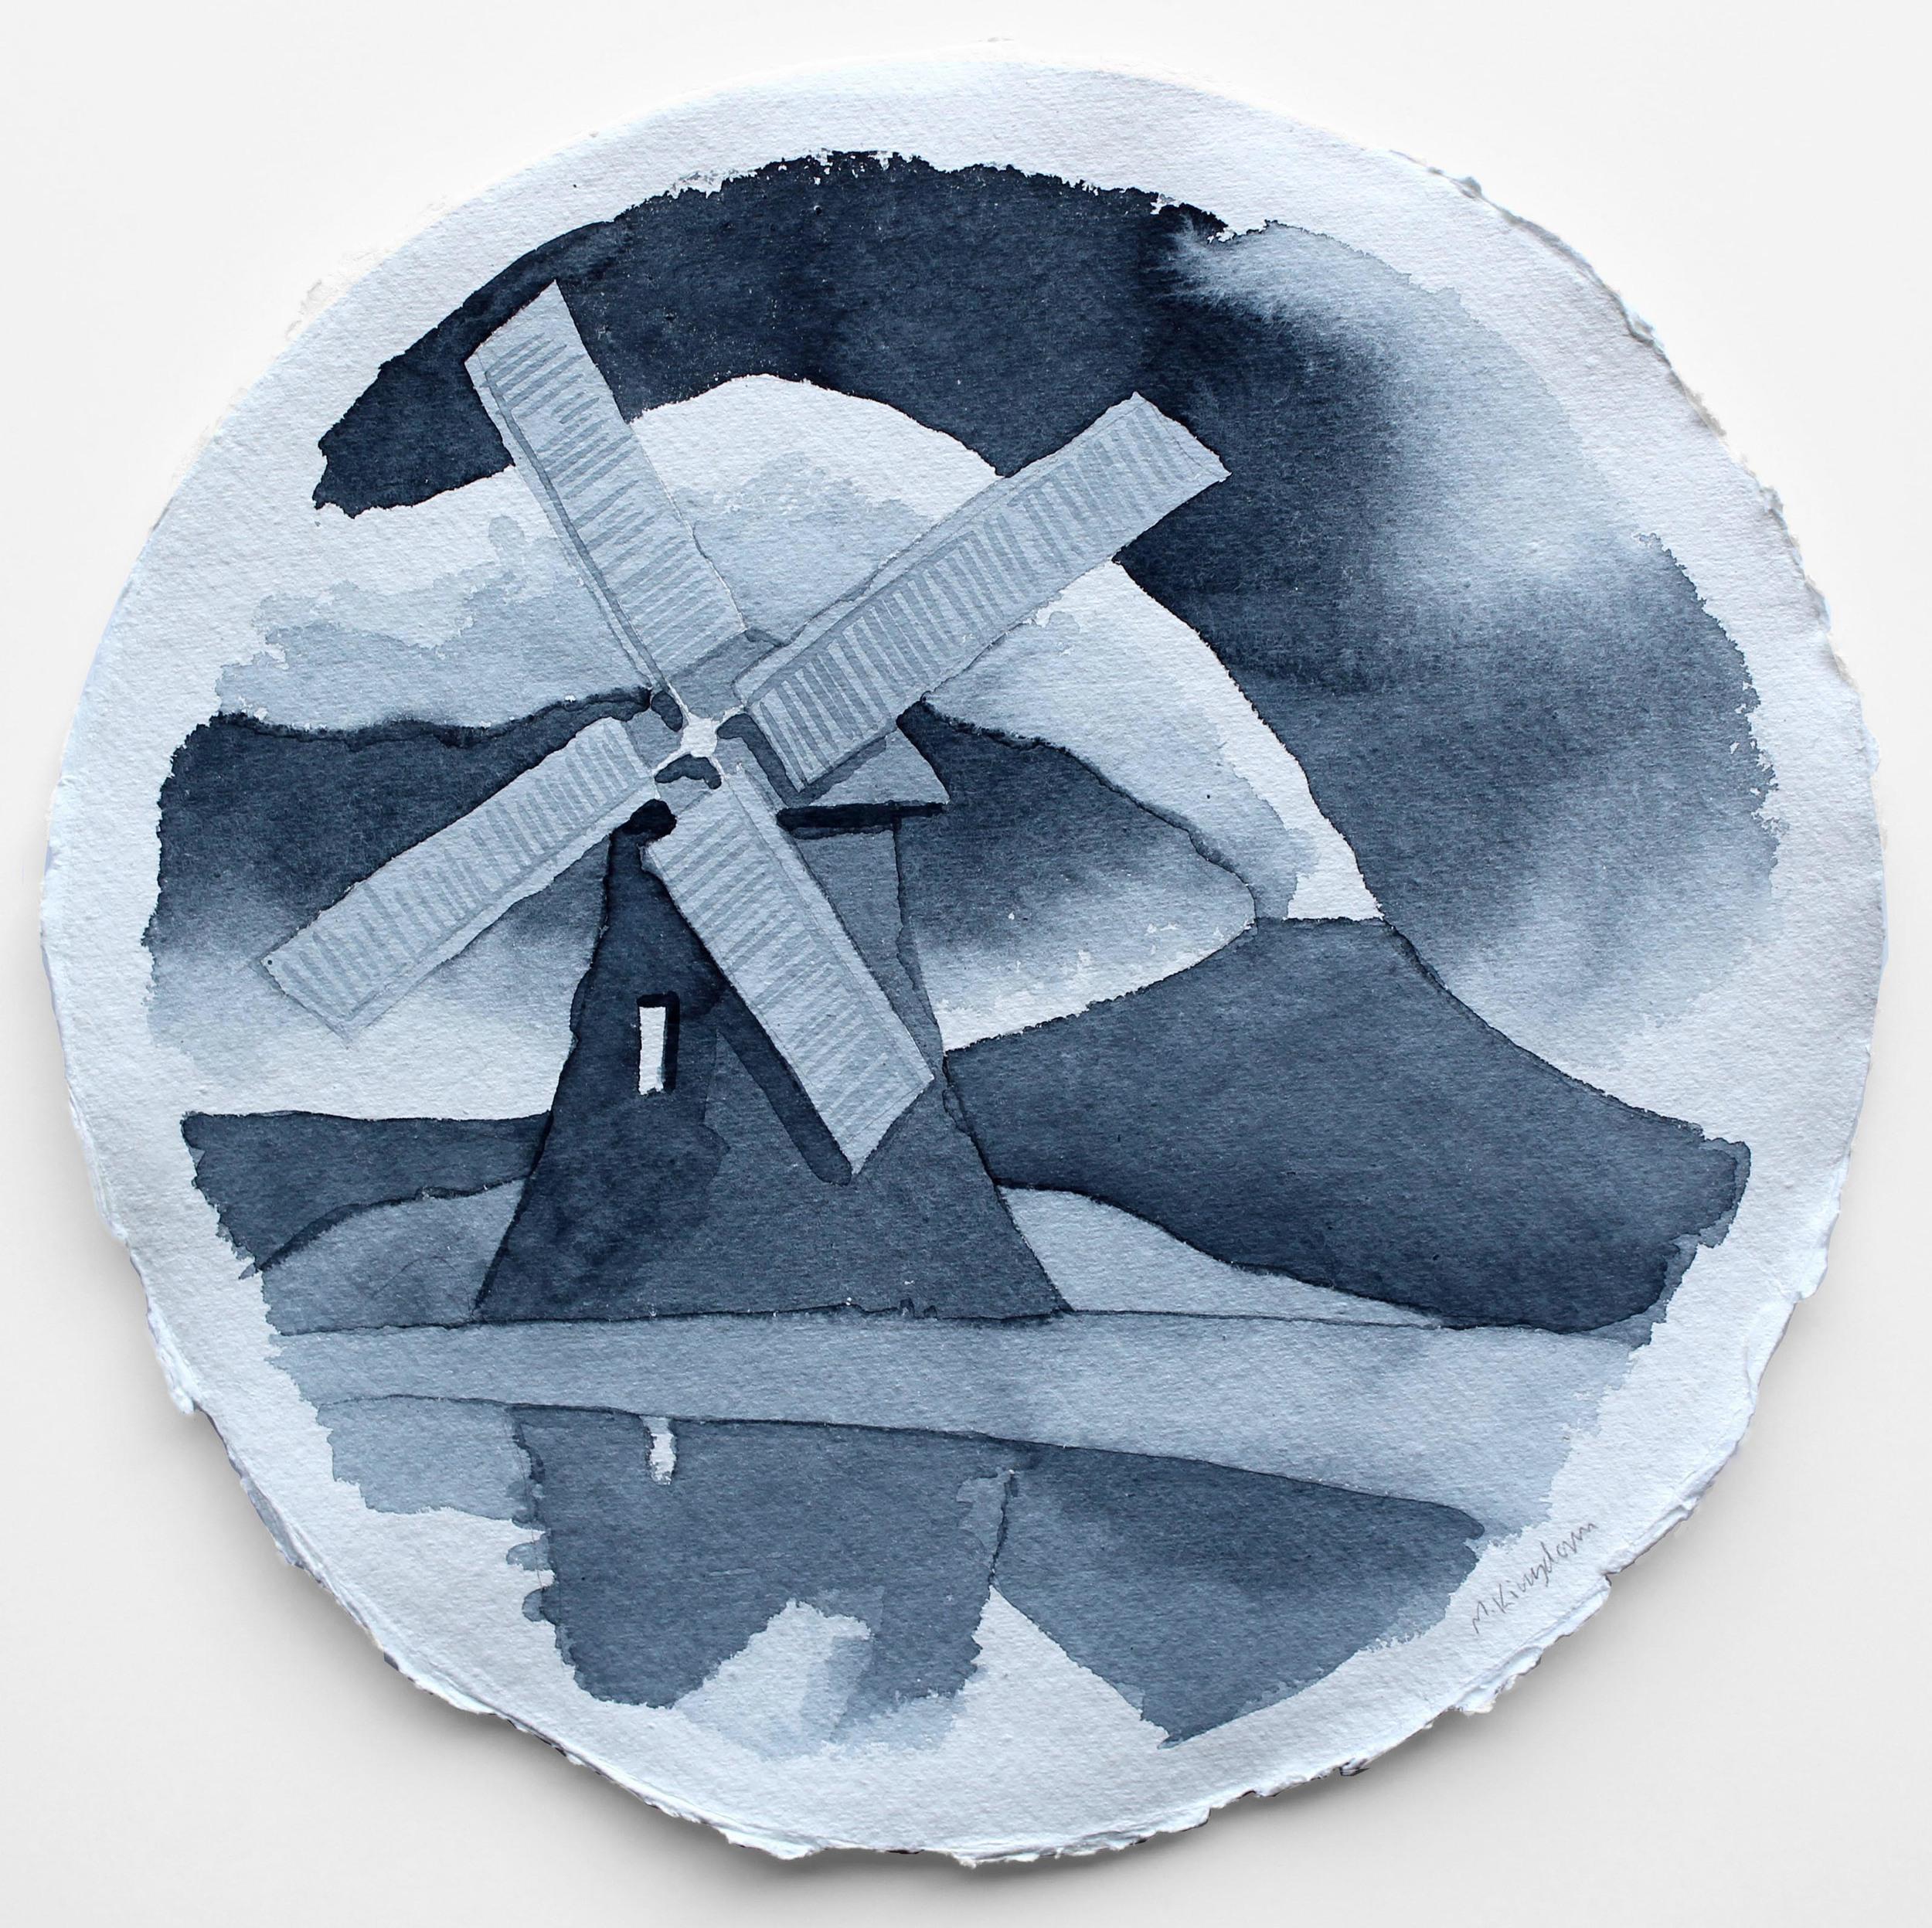 'Creative Destruction (Wind and Heat)'